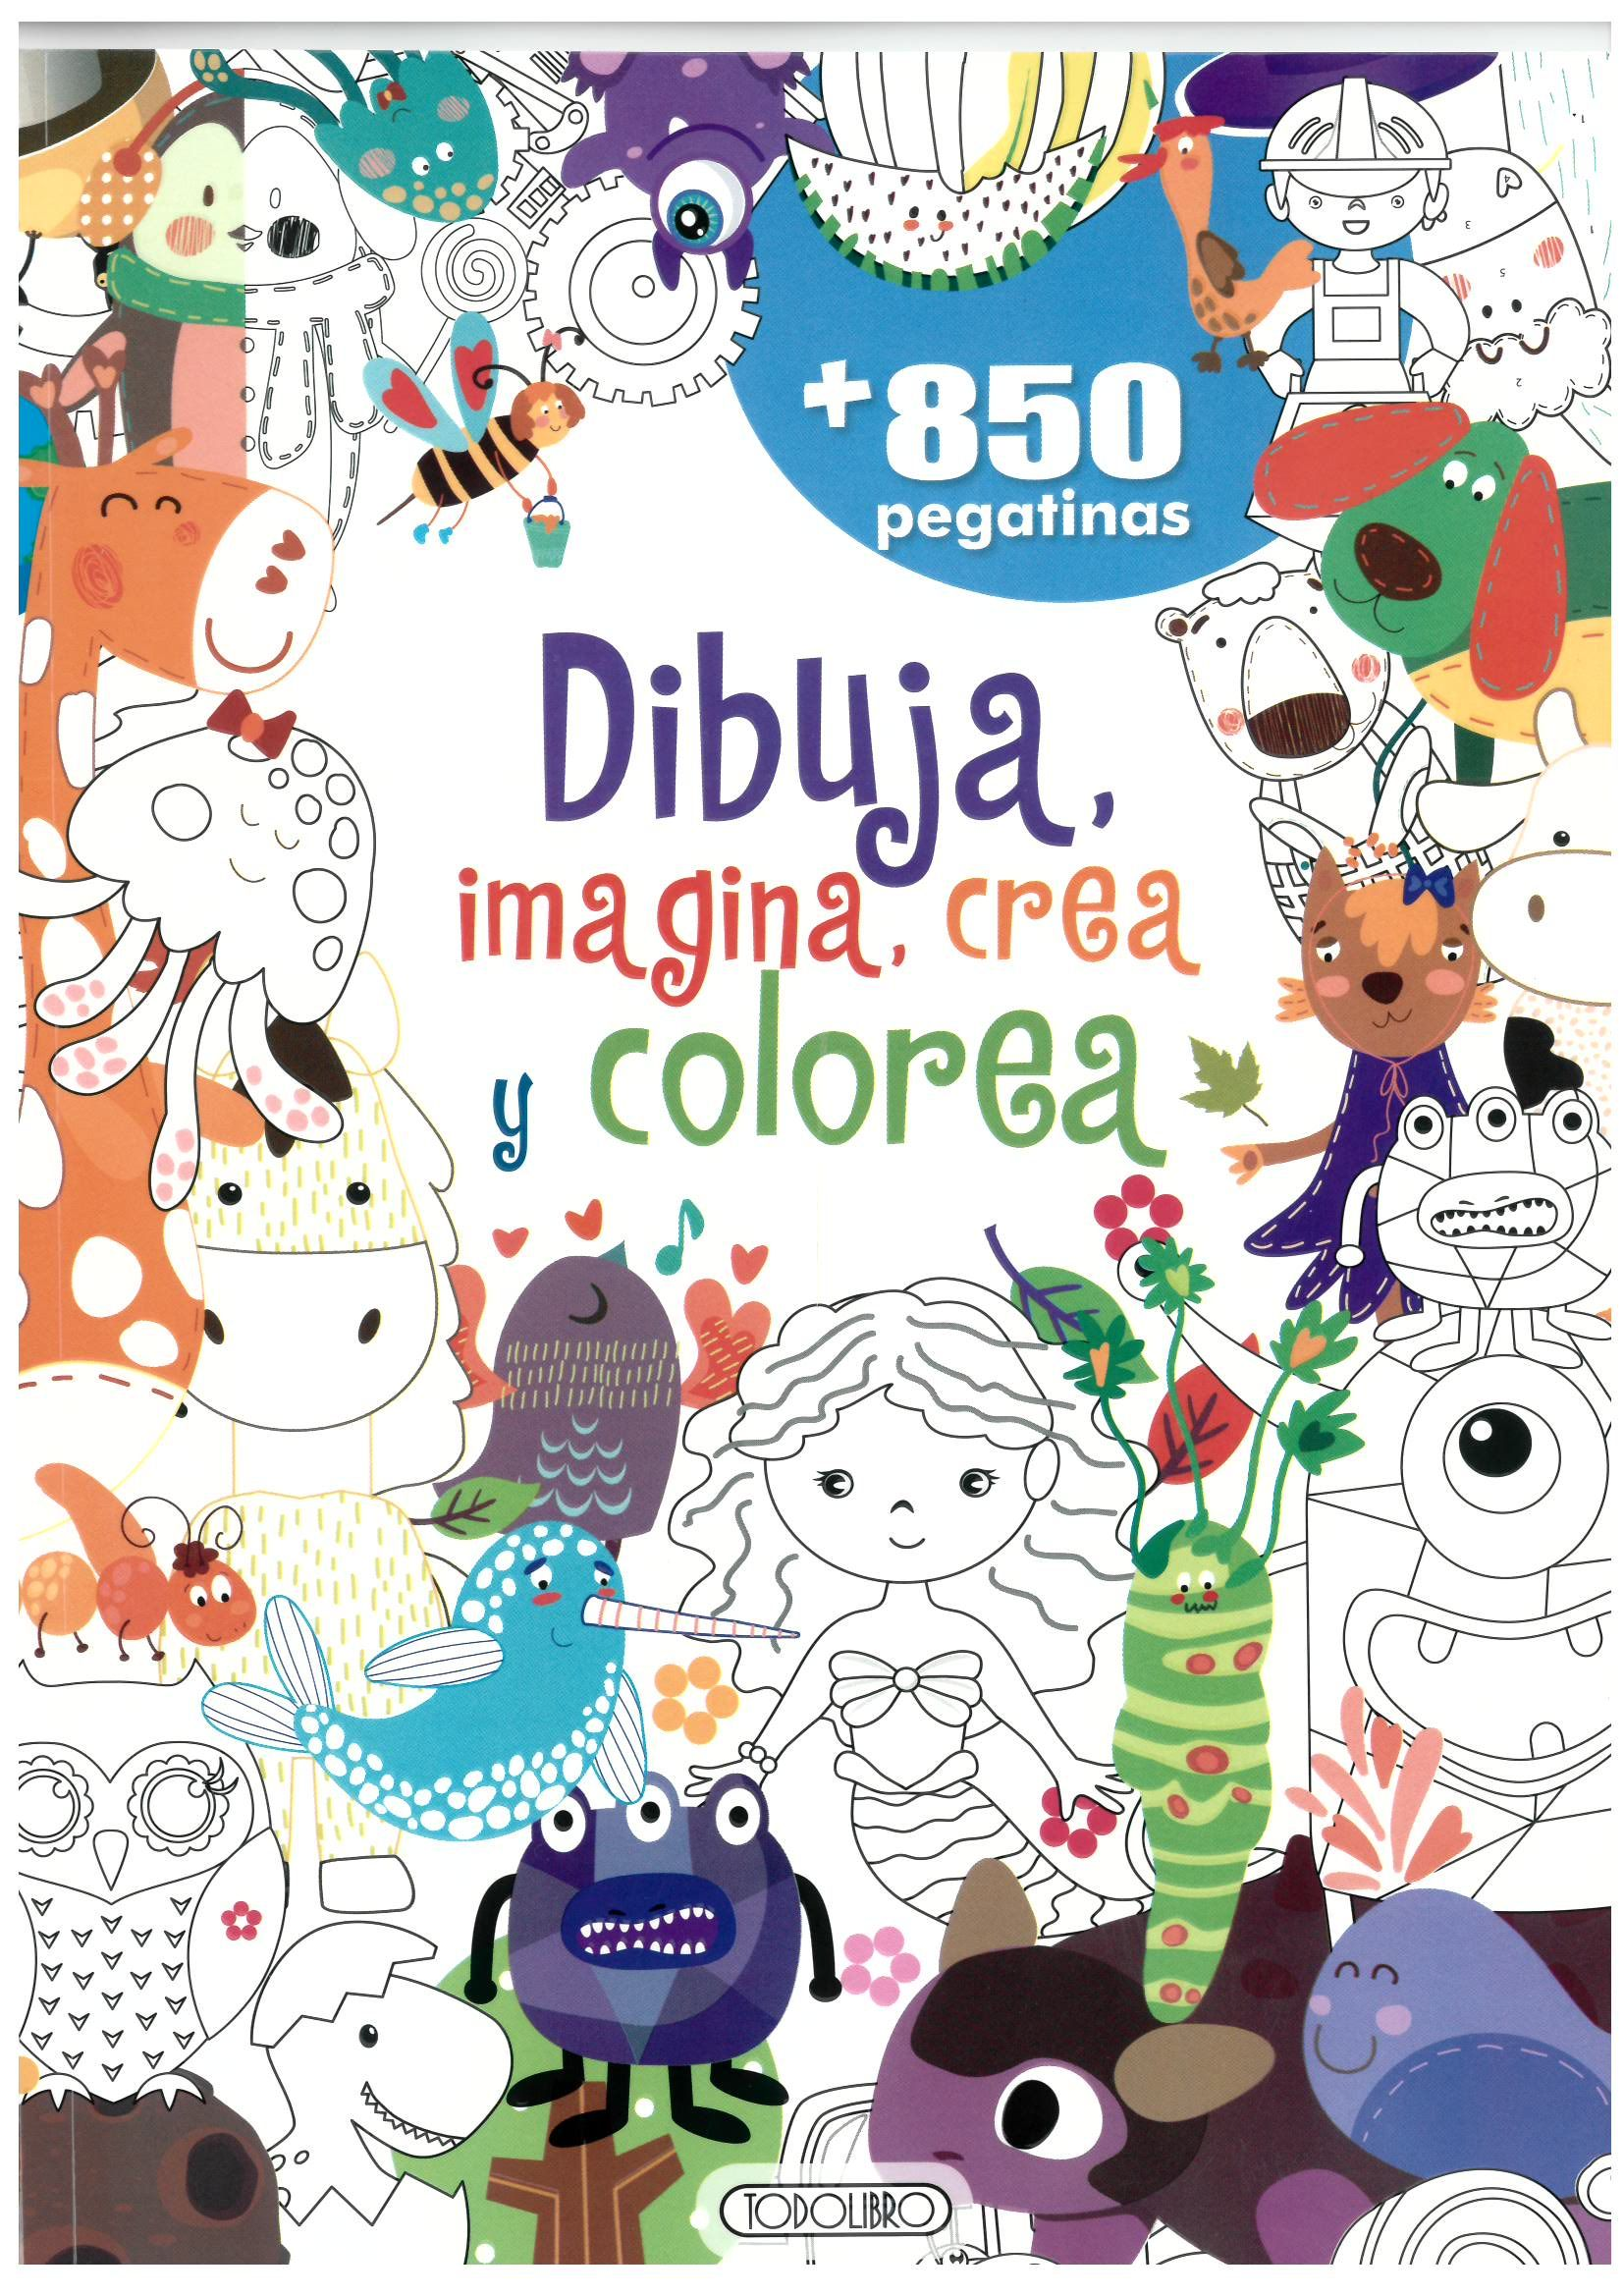 DIBUJA IMAGINA CREA Y COLOREA AZUL